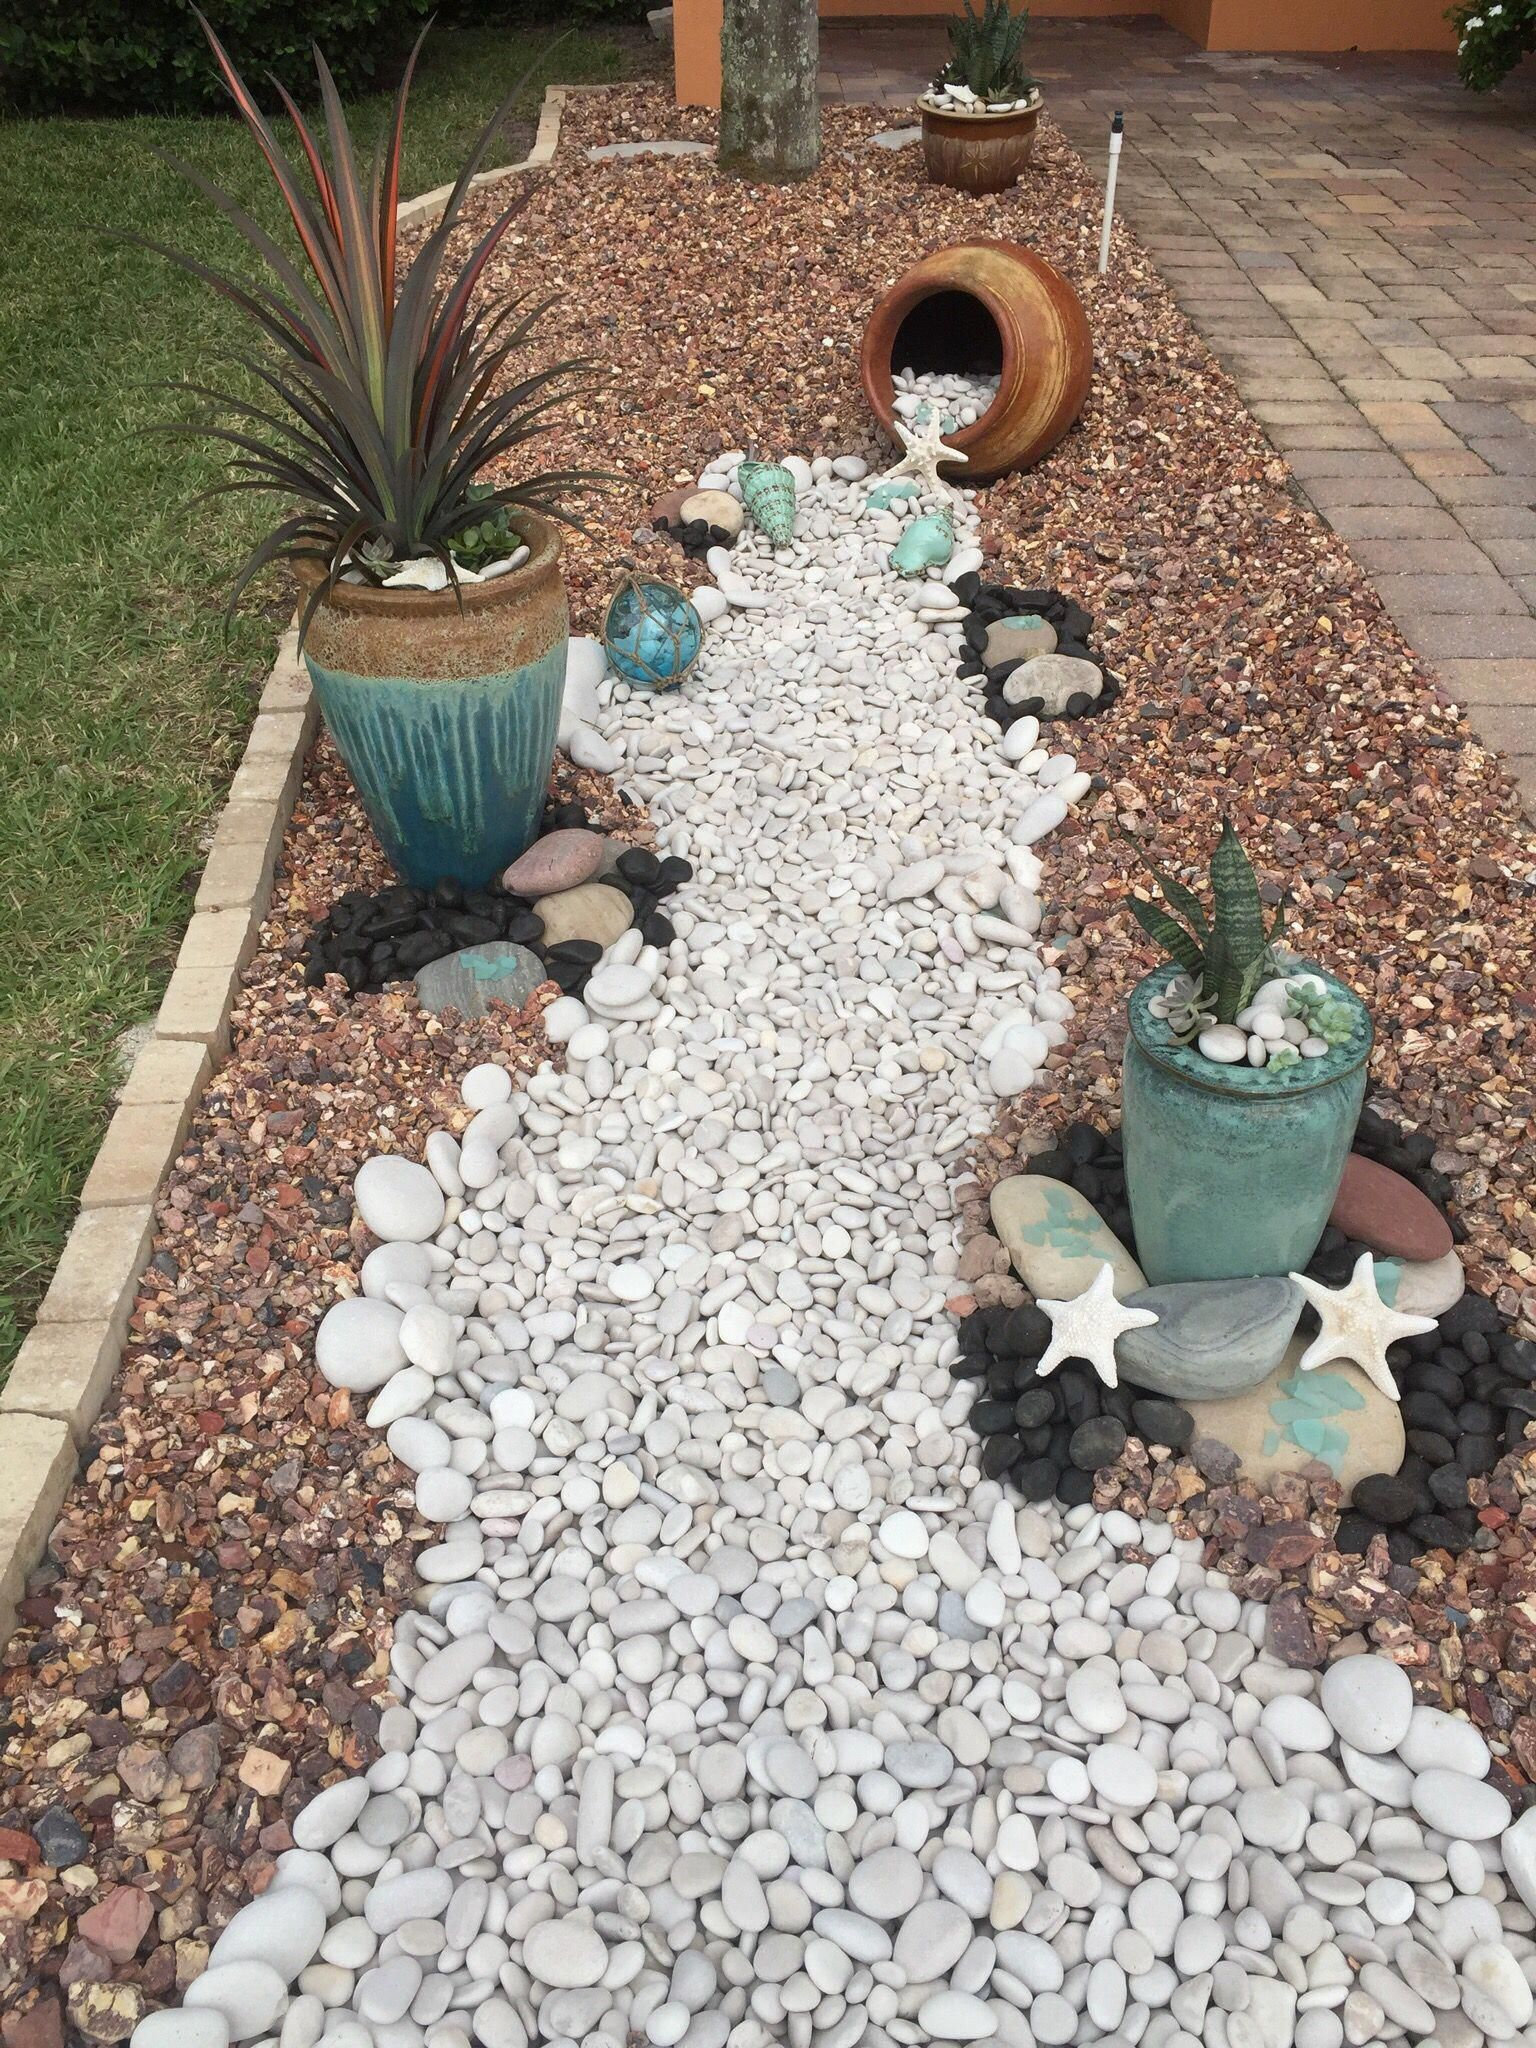 52 fresh front yard and backyard landscaping ideas for - Front yard landscaping ideas with rocks ...